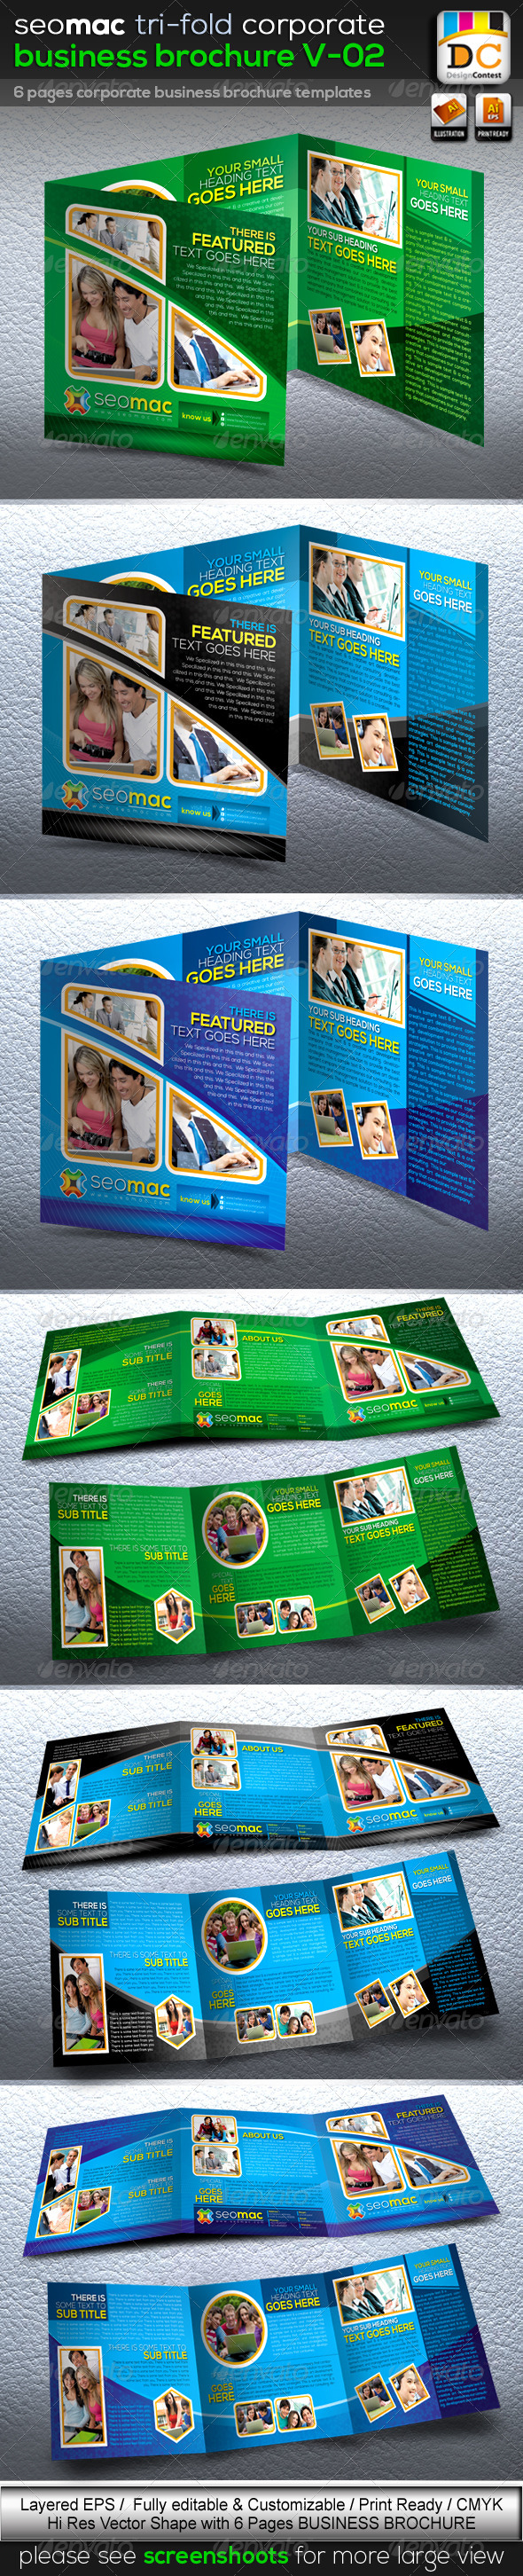 GraphicRiver SeoMac Tri-fold Corporate Business Brochure V-02 3719081